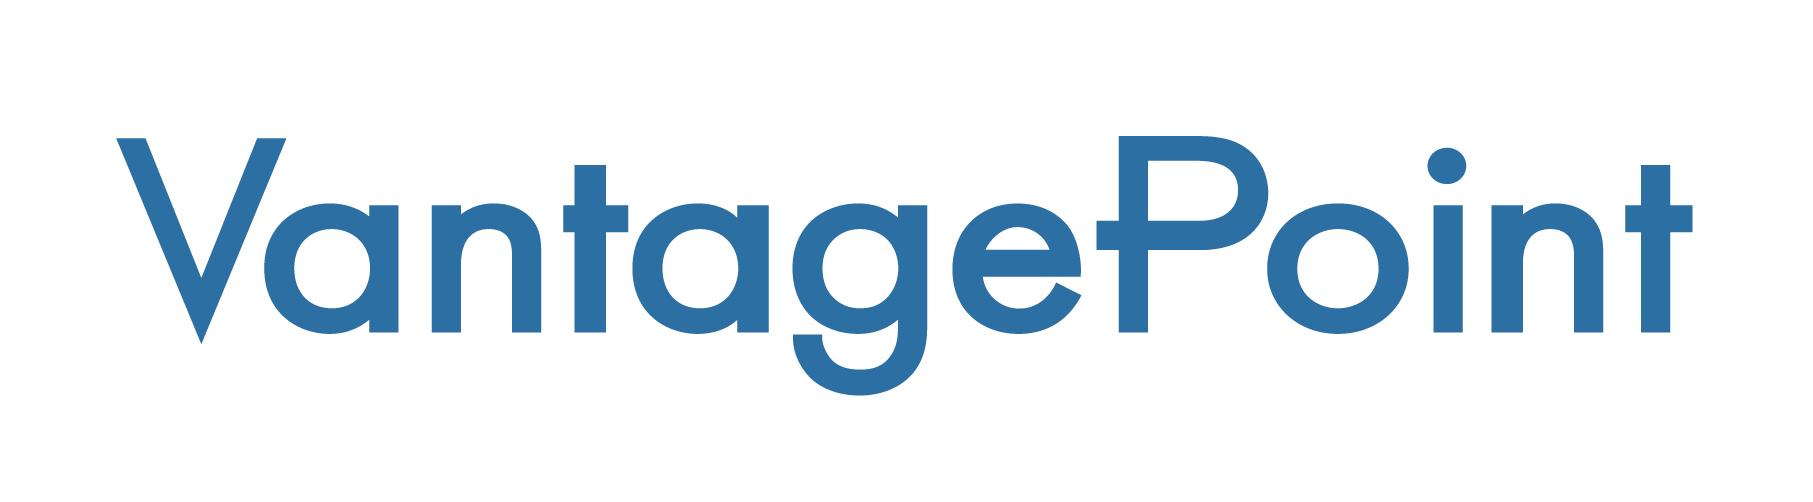 VantagePoint Retina Logo